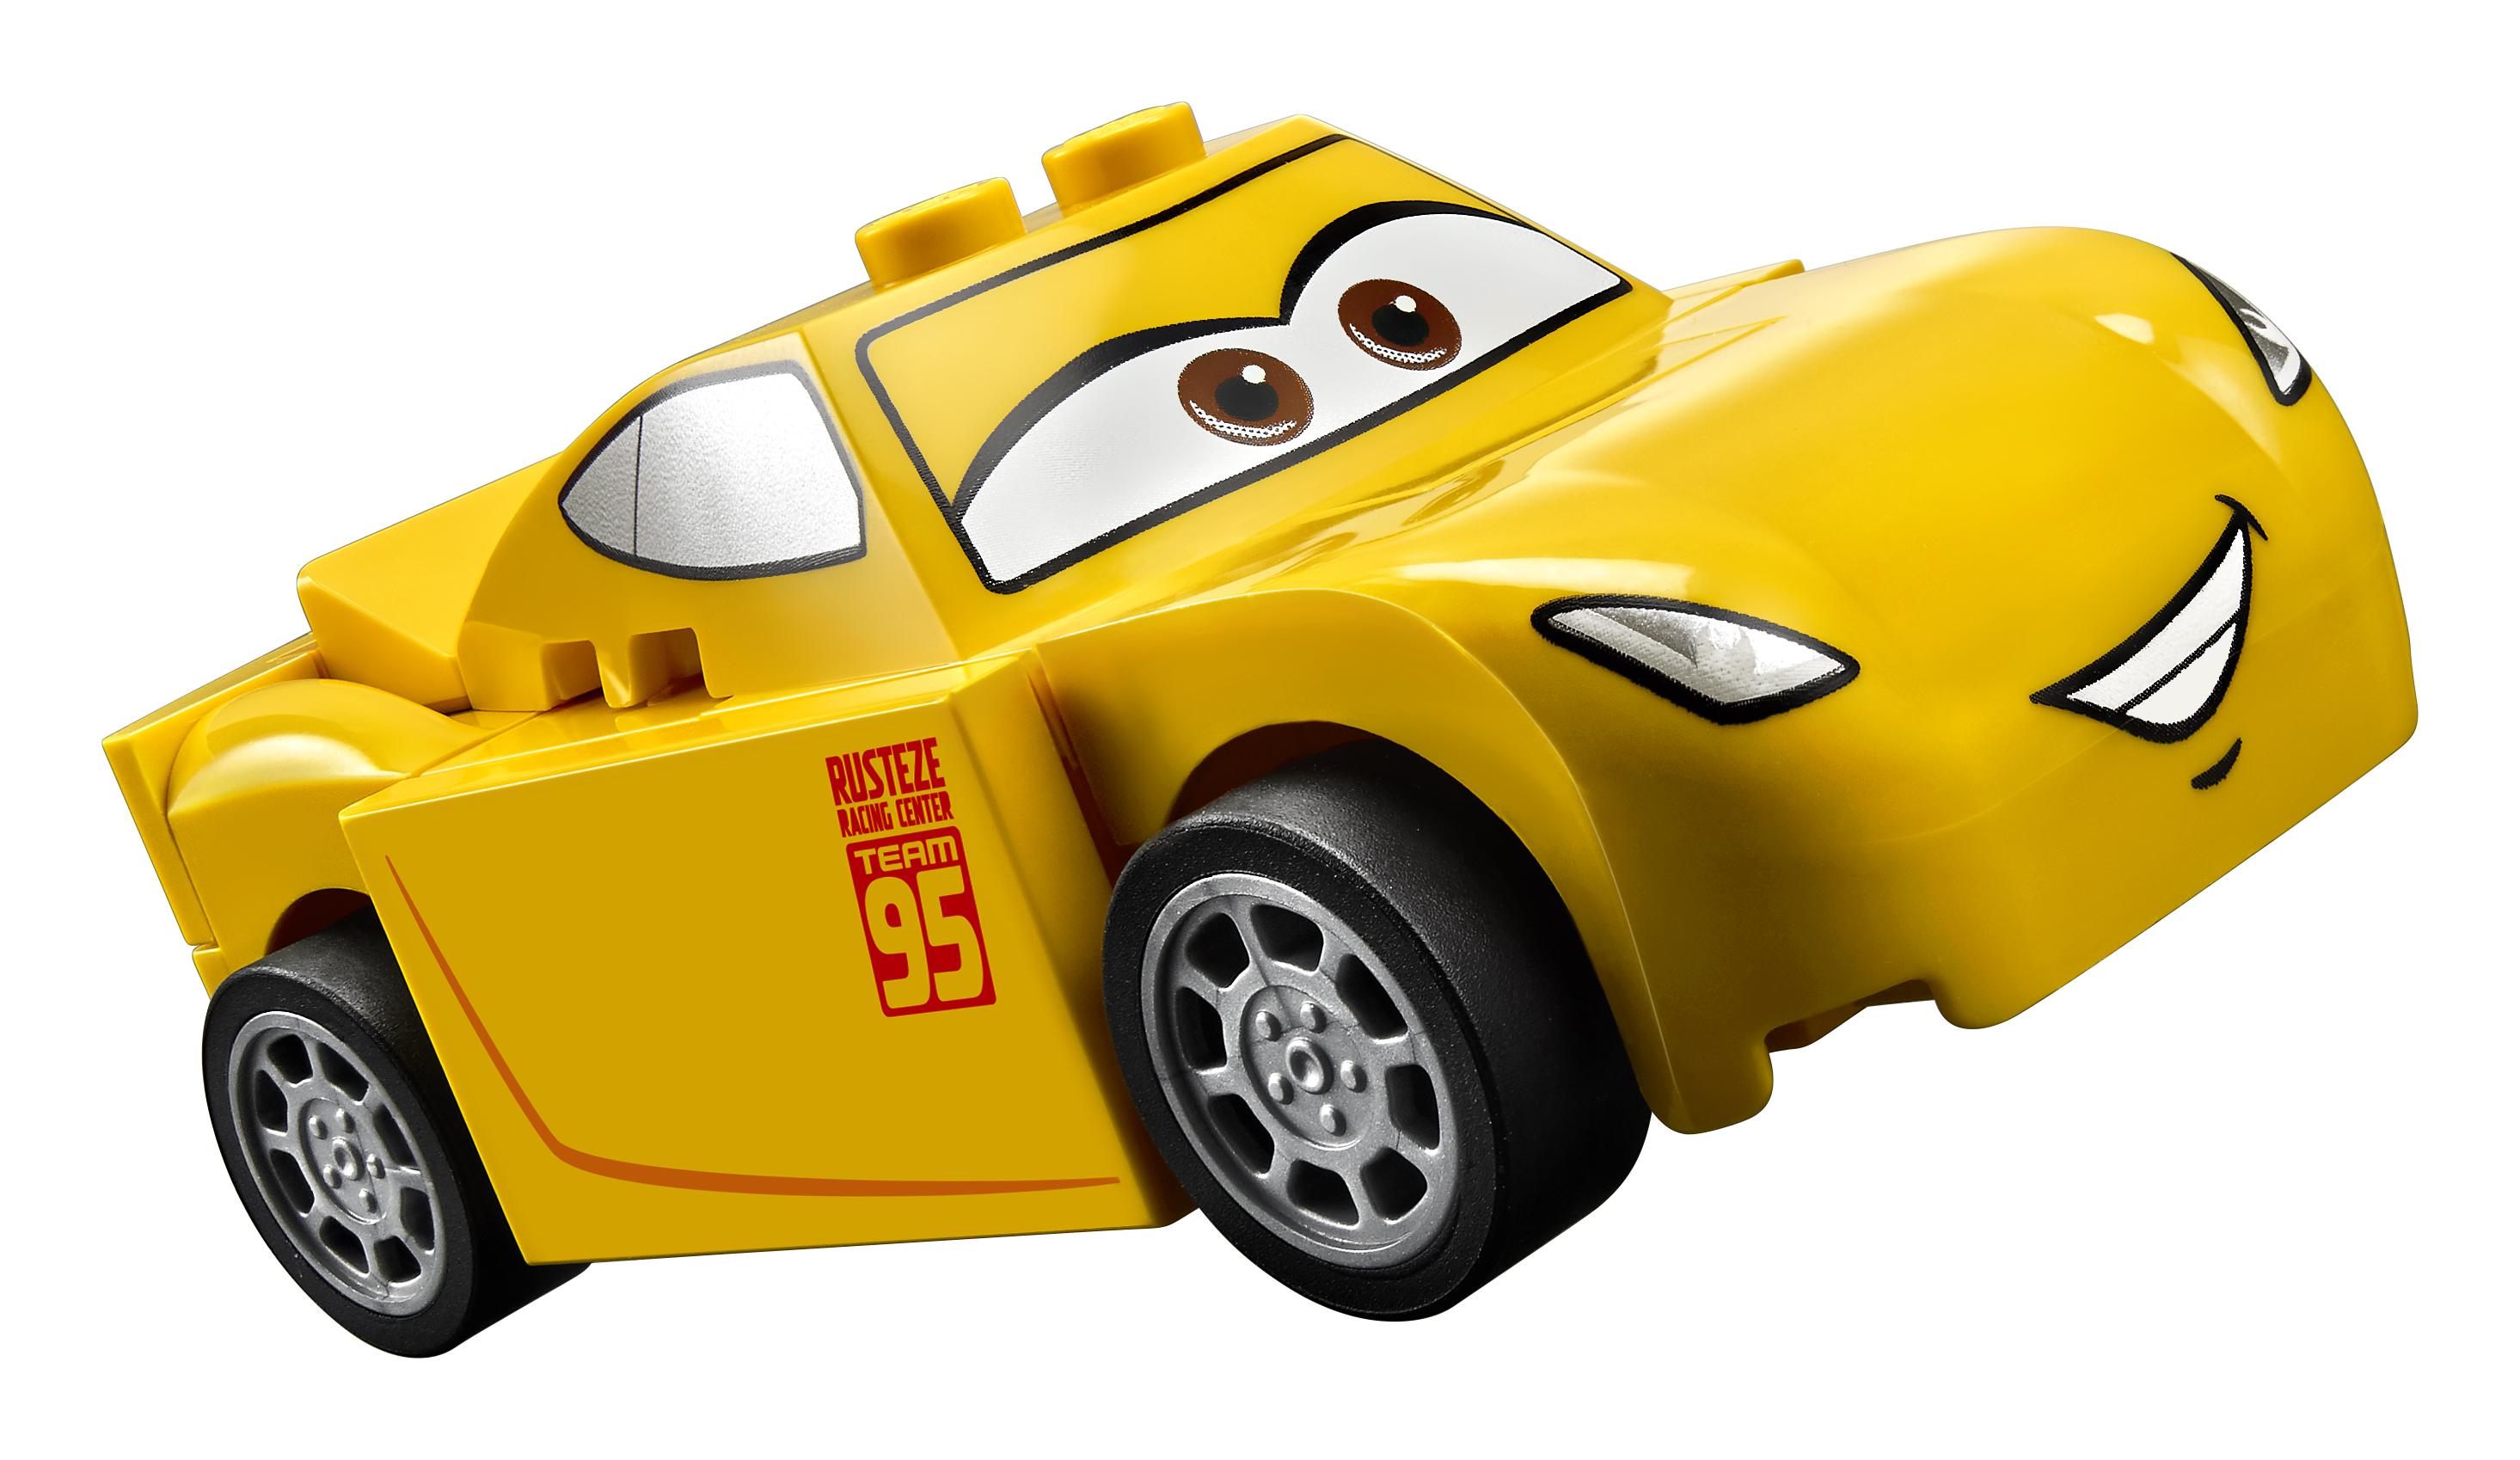 lego announces cars 3 duplo and lego juniors sets. Black Bedroom Furniture Sets. Home Design Ideas